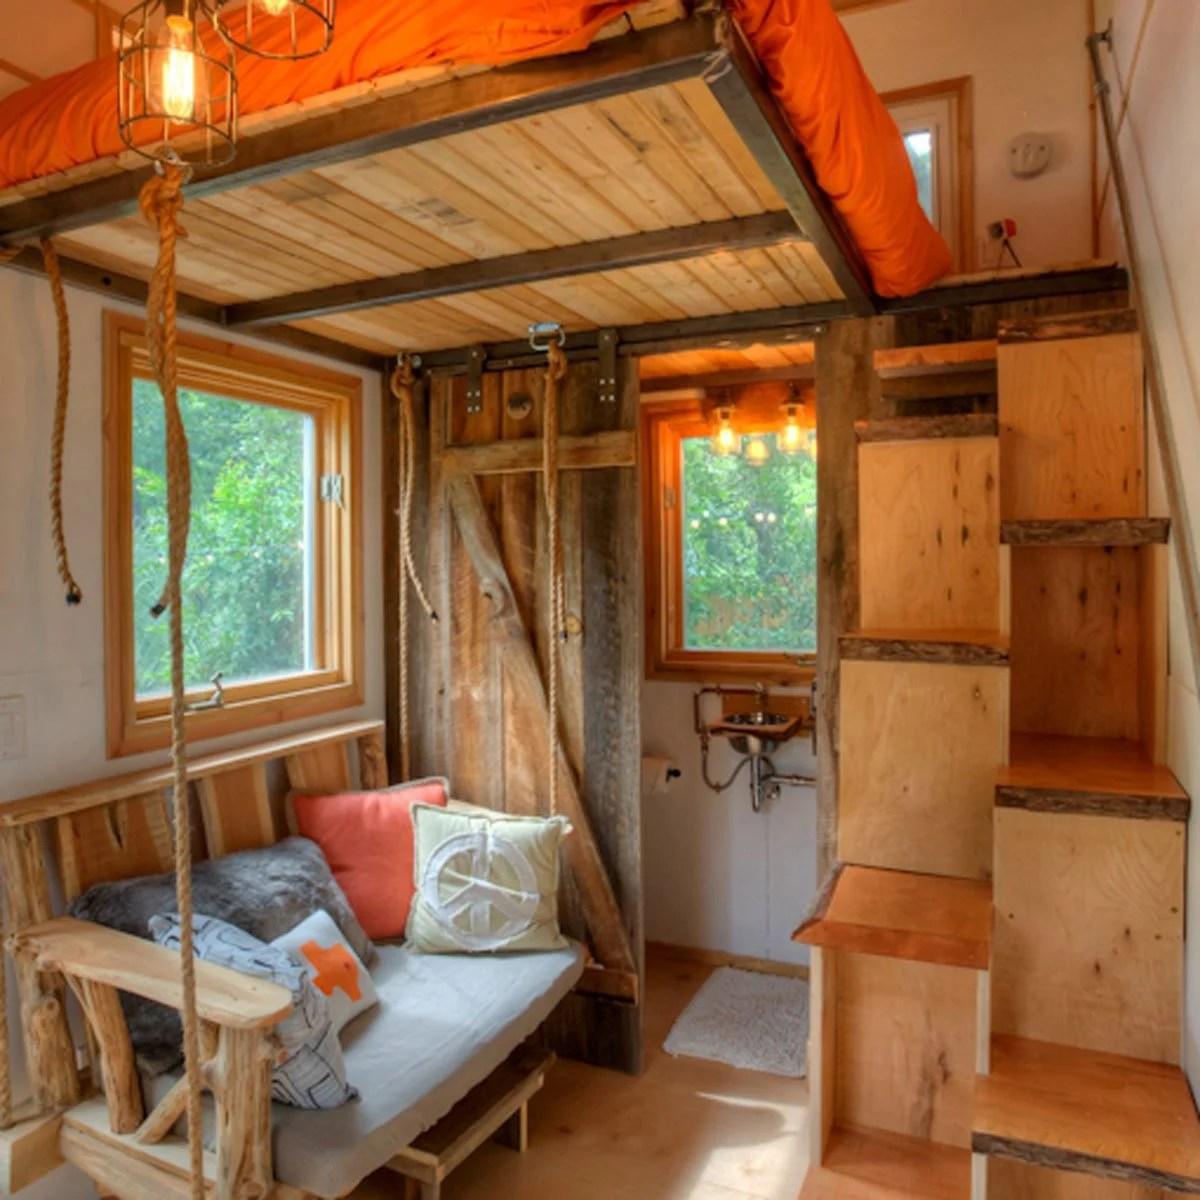 15 Incredible Tiny Homes You Can Buy Now Family Handyman The Family Handyman